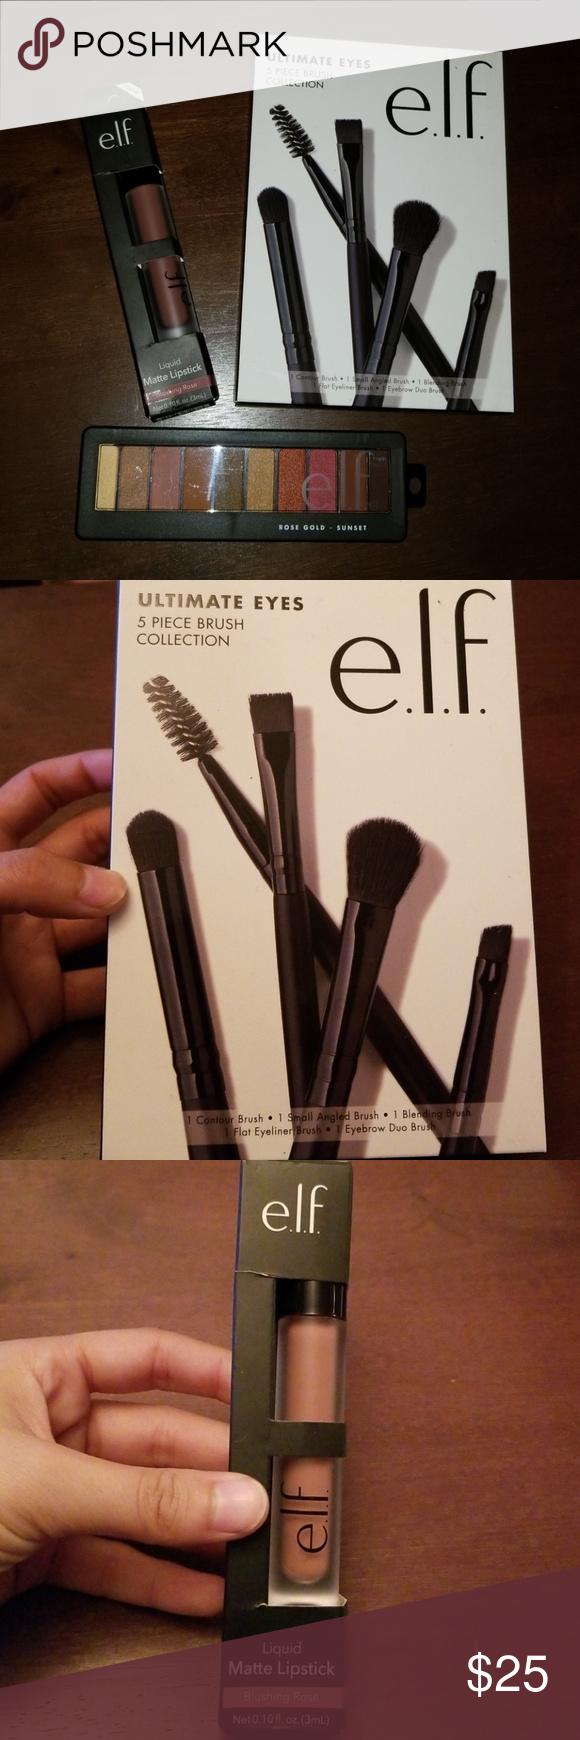 Elf Makeup Bundle NWT Makeup bundles, Eye brushes set